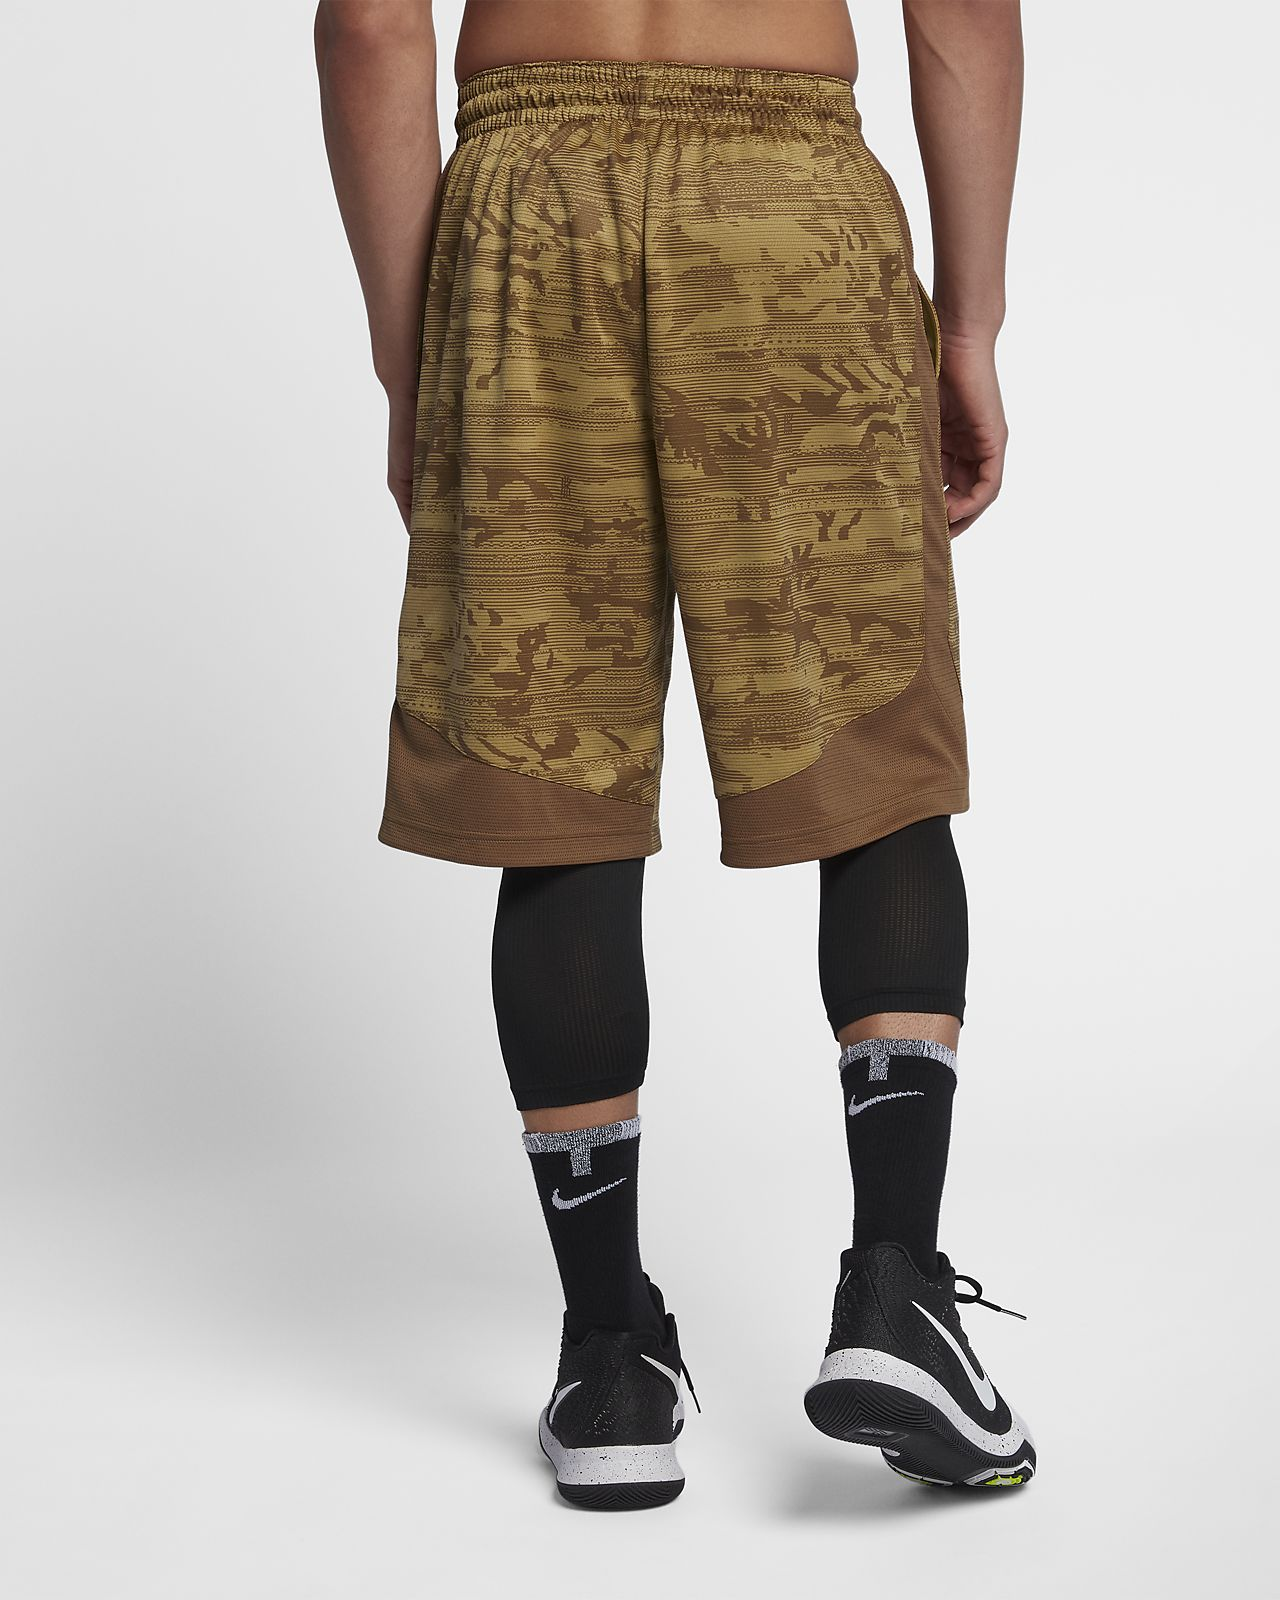 861907ce038d Nike Dri-FIT Elite Kyrie Mens Printed 11.5